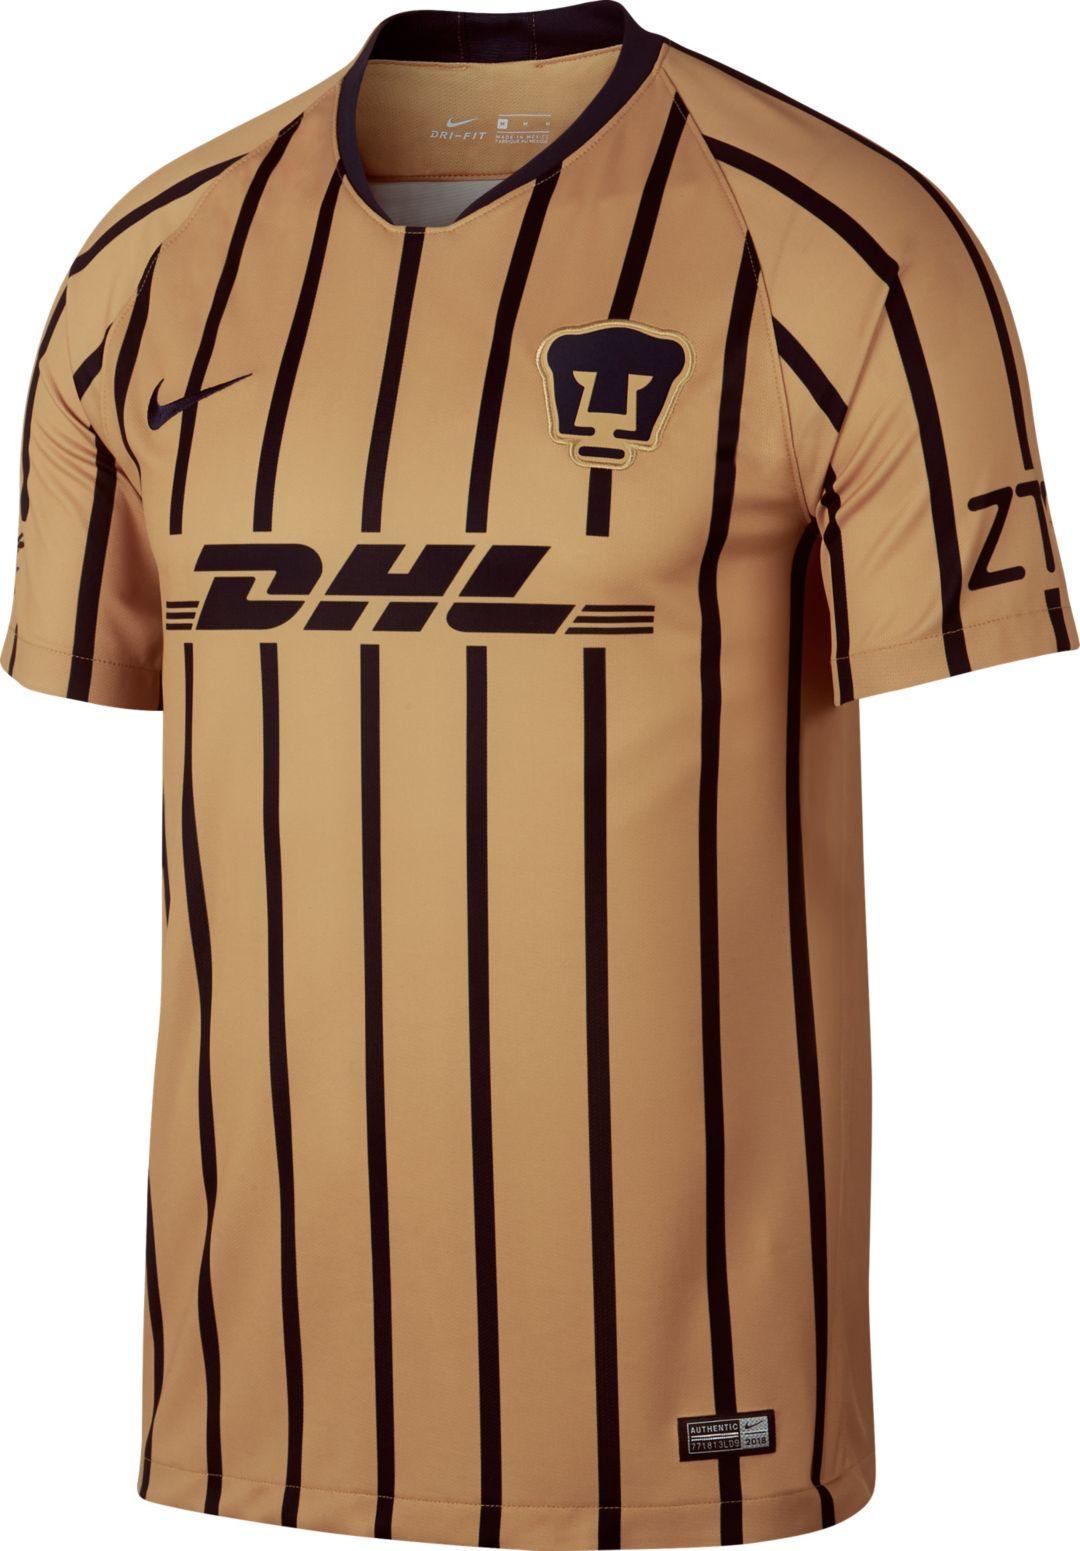 innovative design 3c1e5 05921 Nike Youth Pumas UNAM 2018 Breathe Stadium Away Replica Jersey